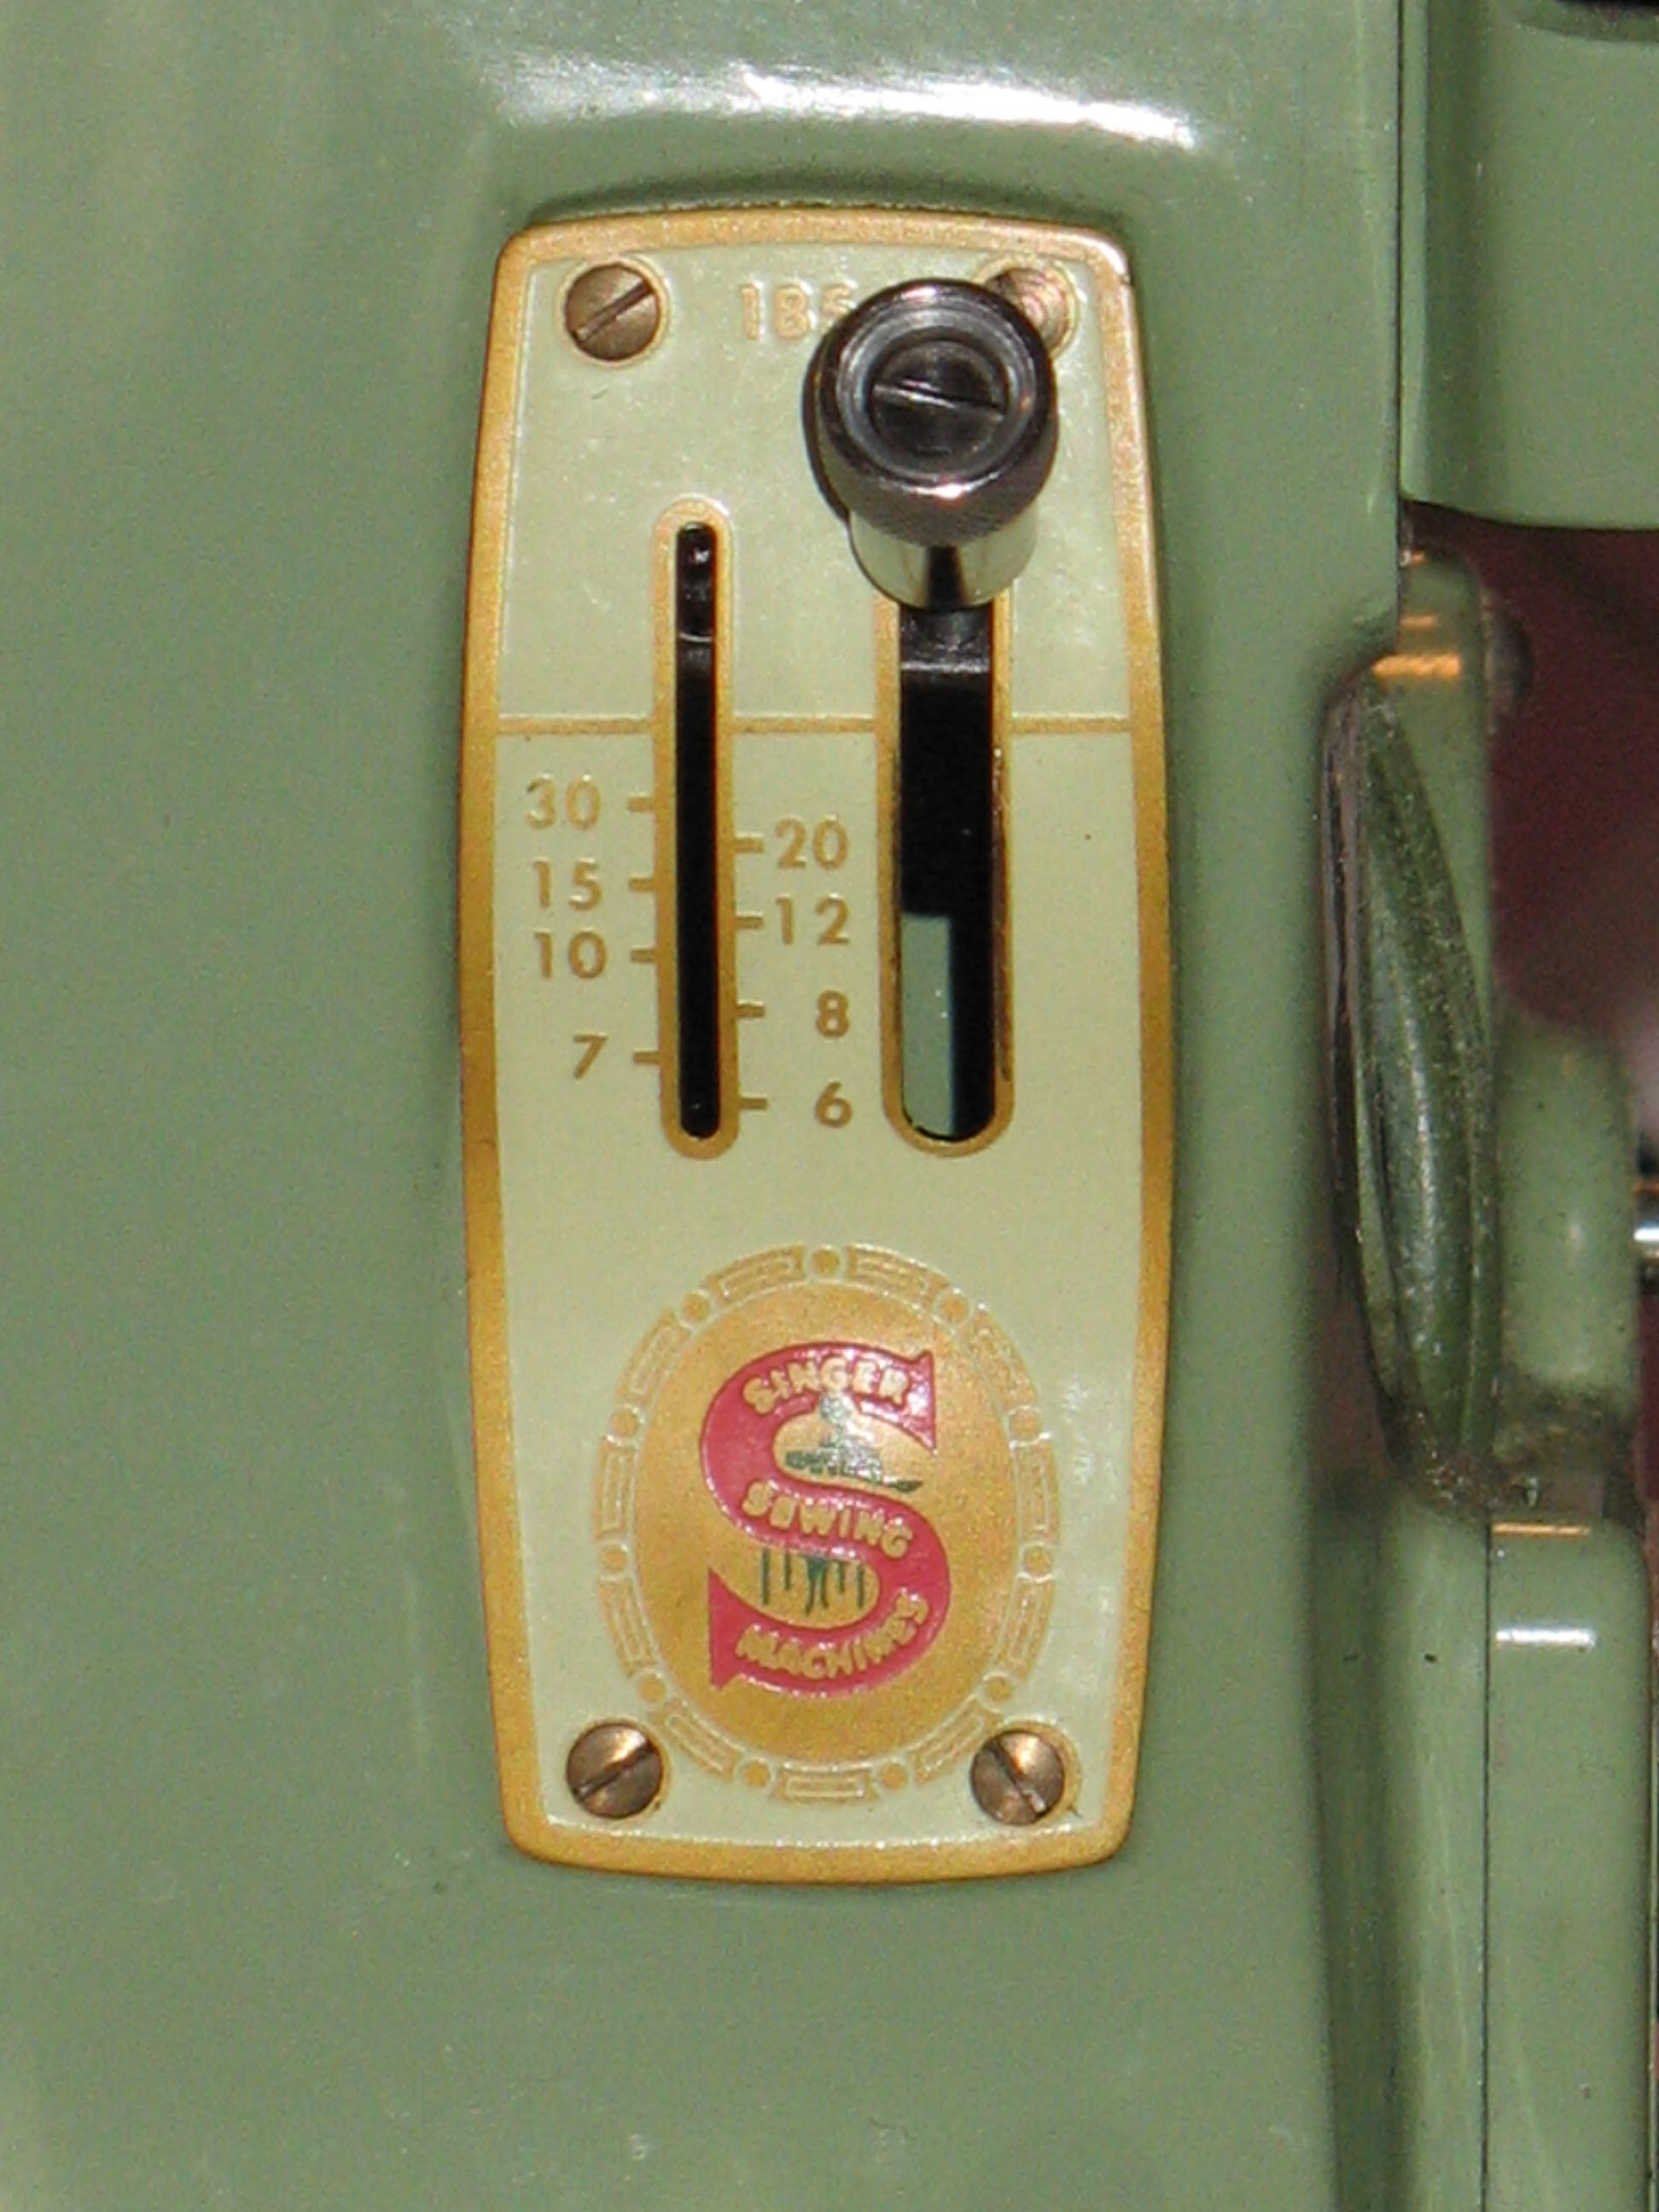 sewing machine with stitch regulator